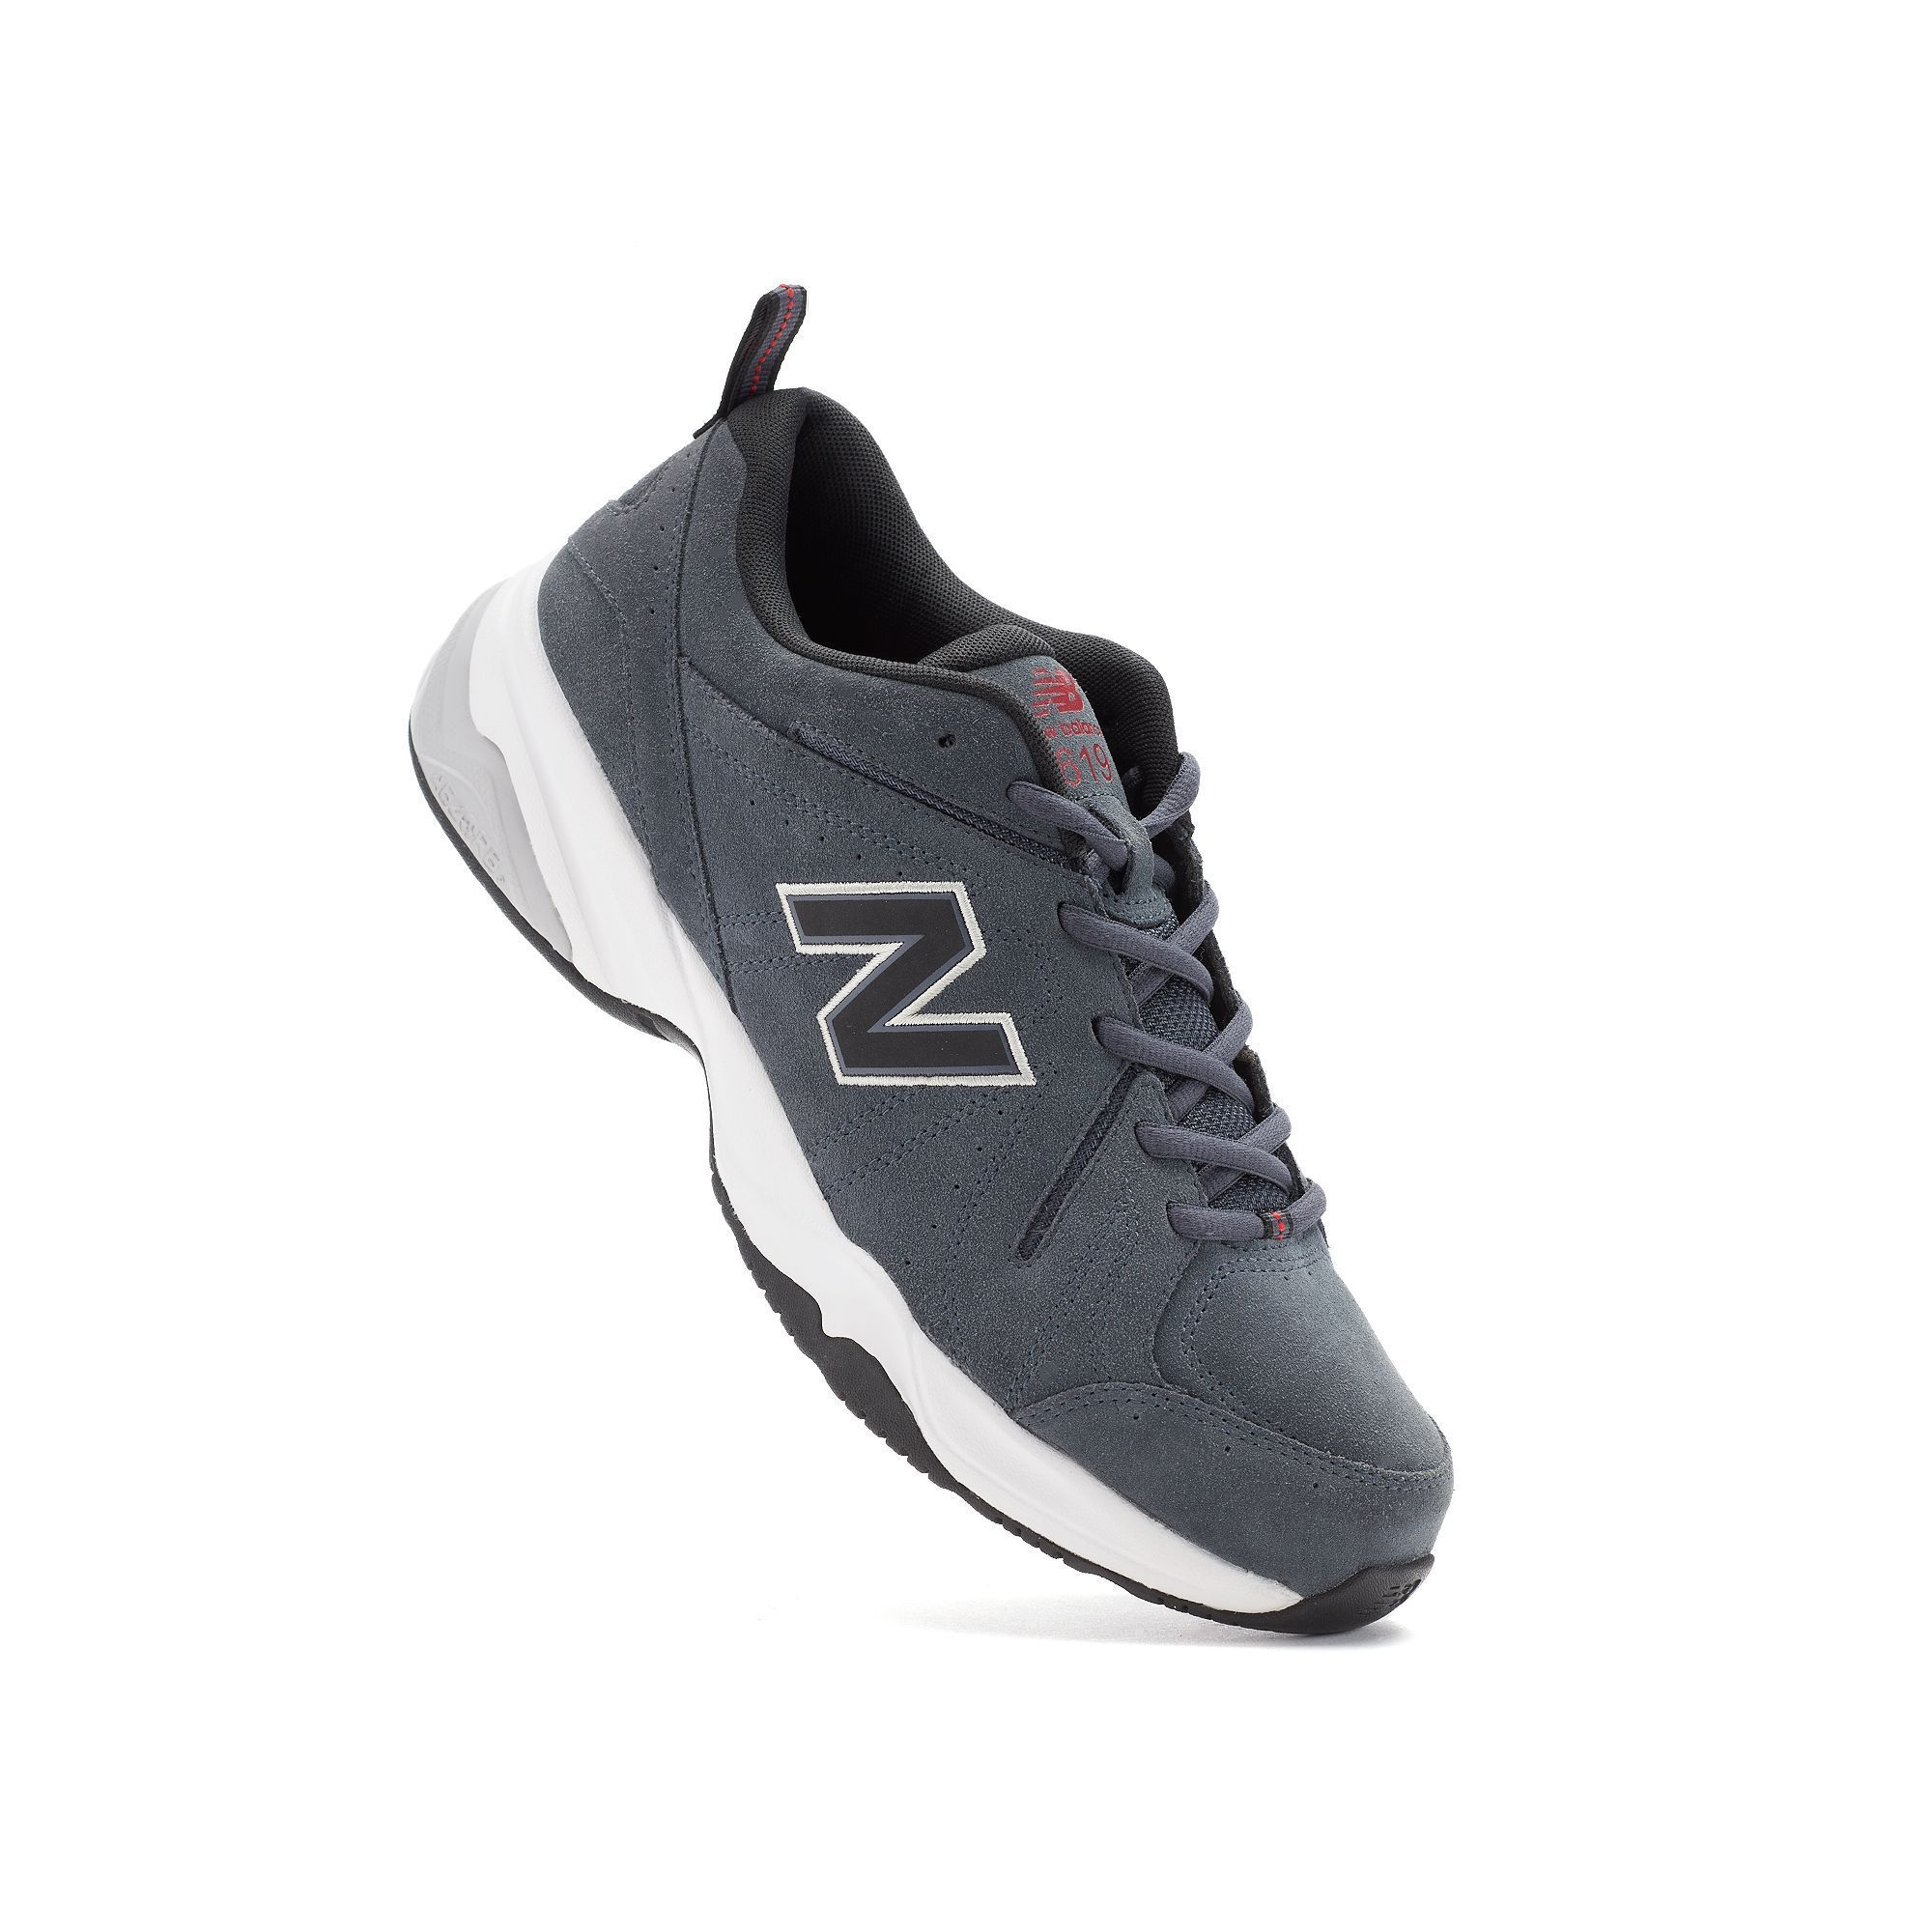 New Balance 619 v1 Men's Suede ... Cross-Training Shoes lReLPvLp